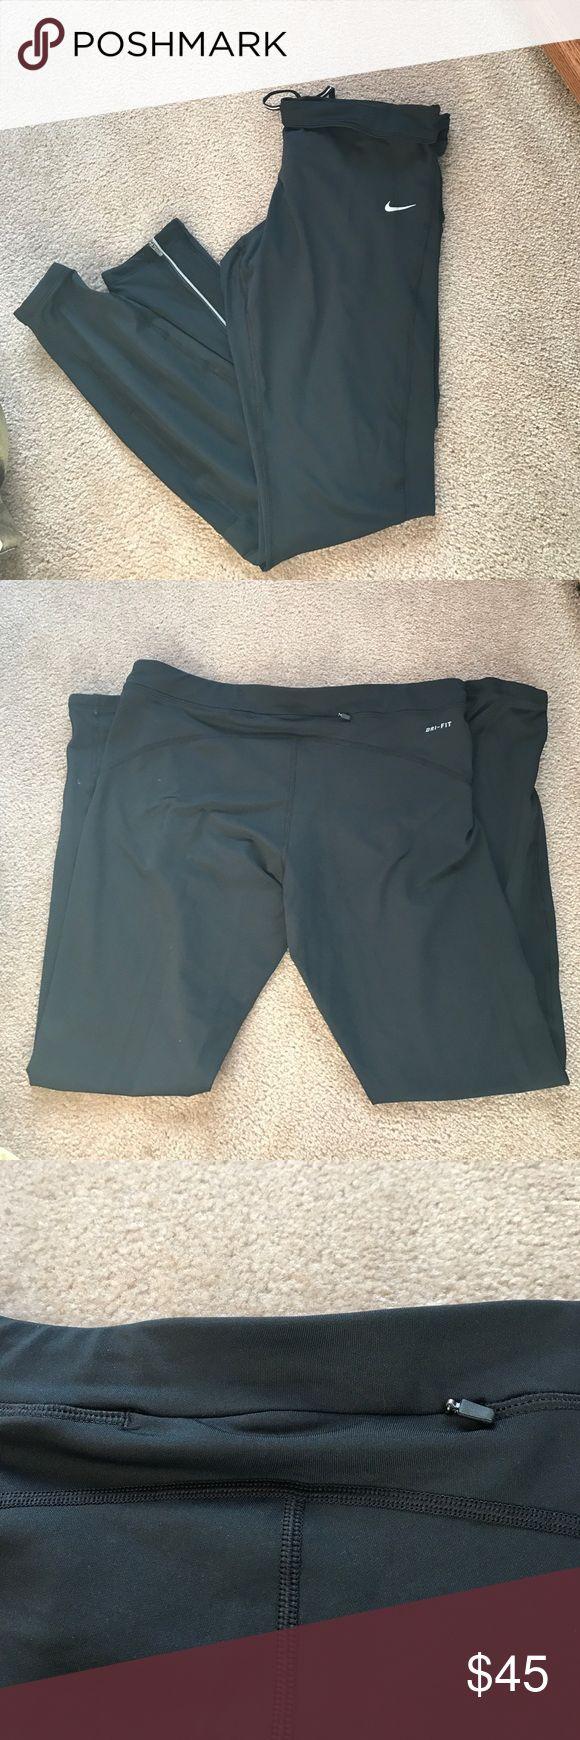 Nike running pants NWOT never worn, black Nike running dry fit pants, bottom of leg has zippers to make leg wider Nike Pants Track Pants & Joggers